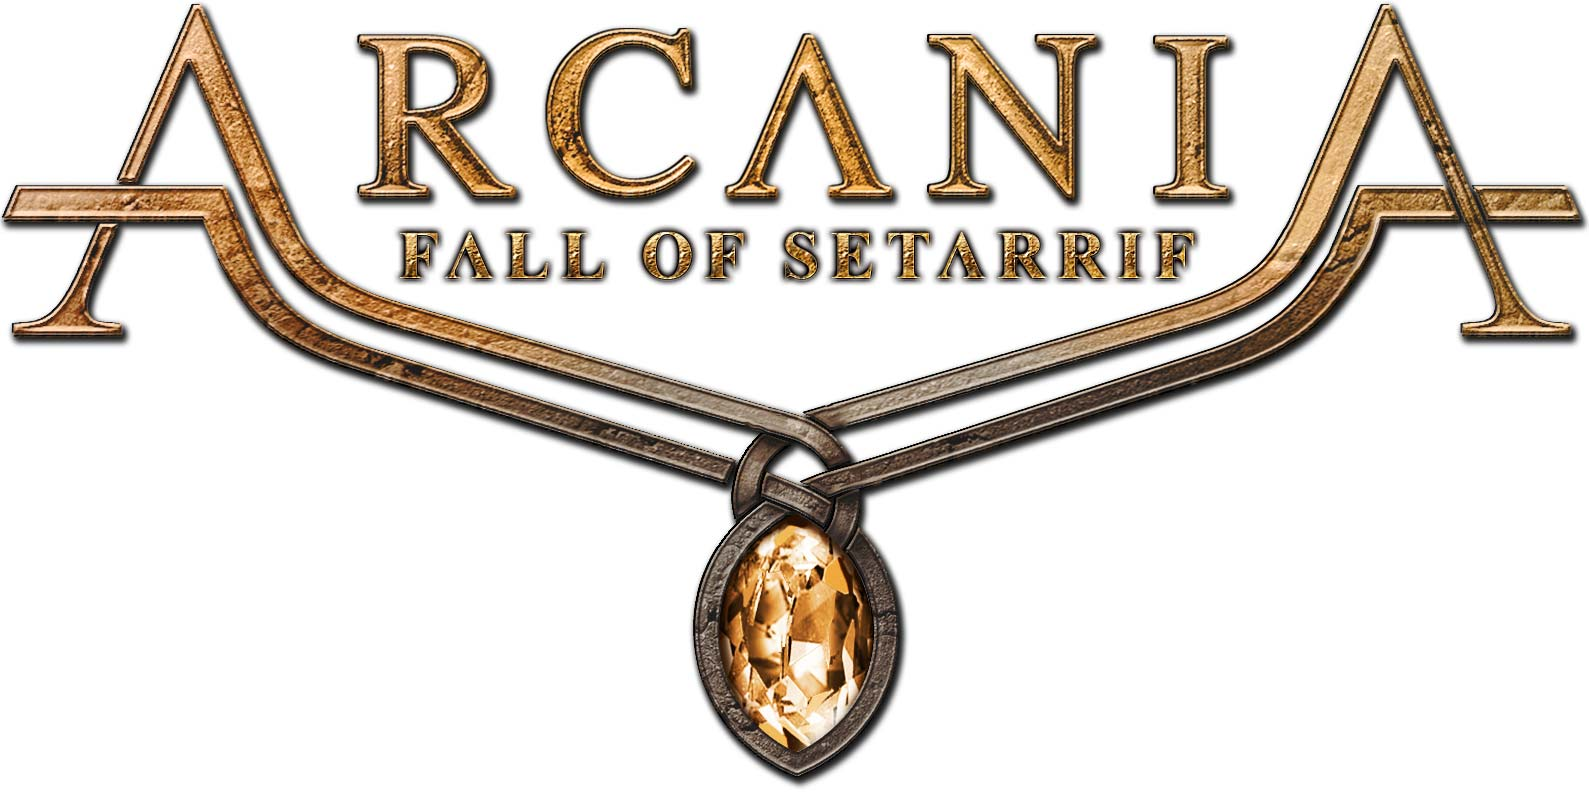 arcania_fall-of-setarrif_addon_logo.jpg